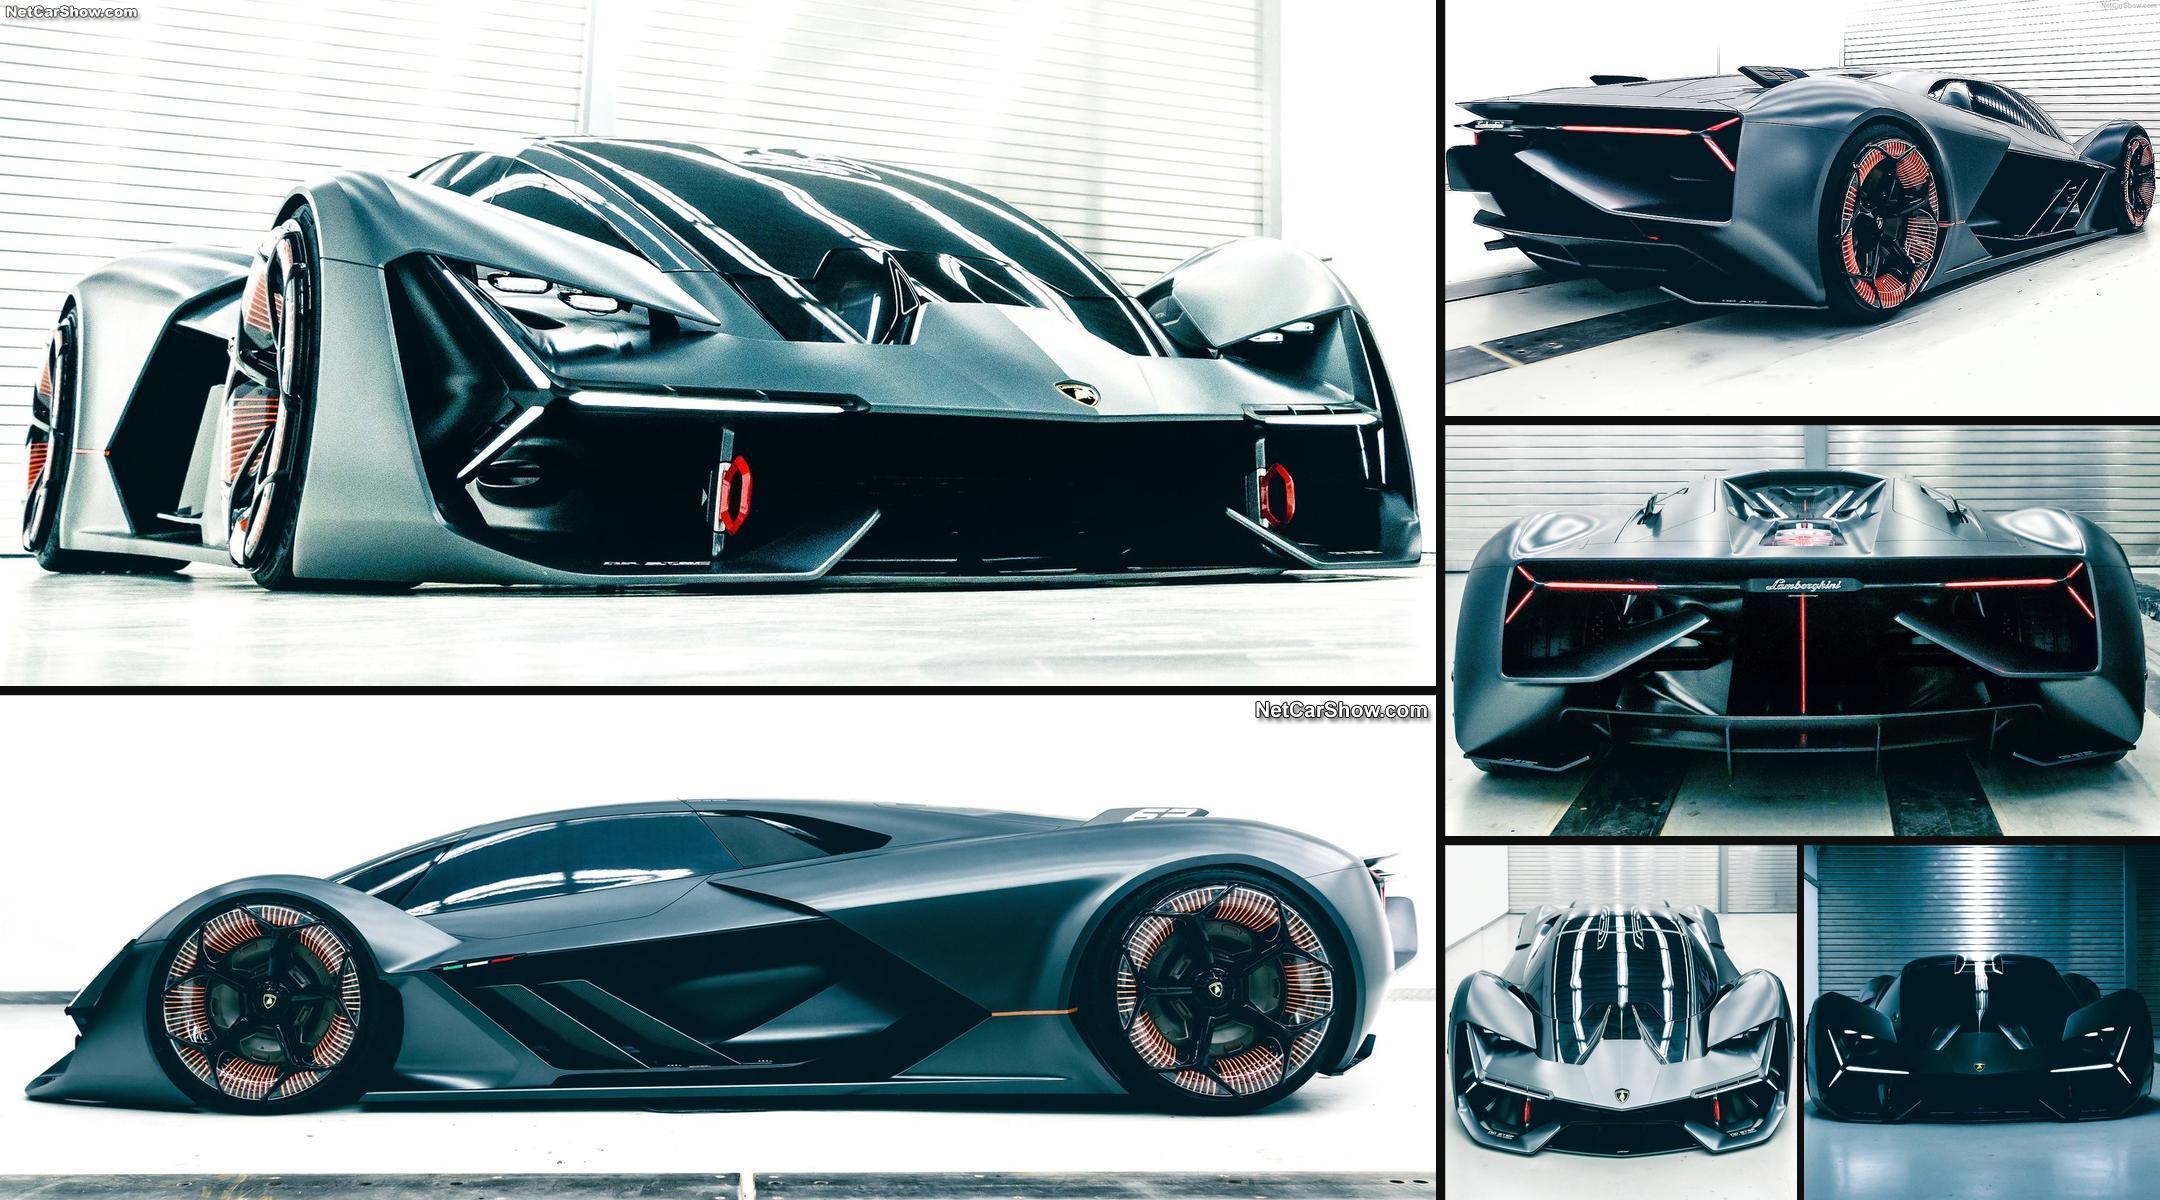 2_1519003299333_Lamborghini-Terzo_Millennio_Concept-2017-ig.jpg